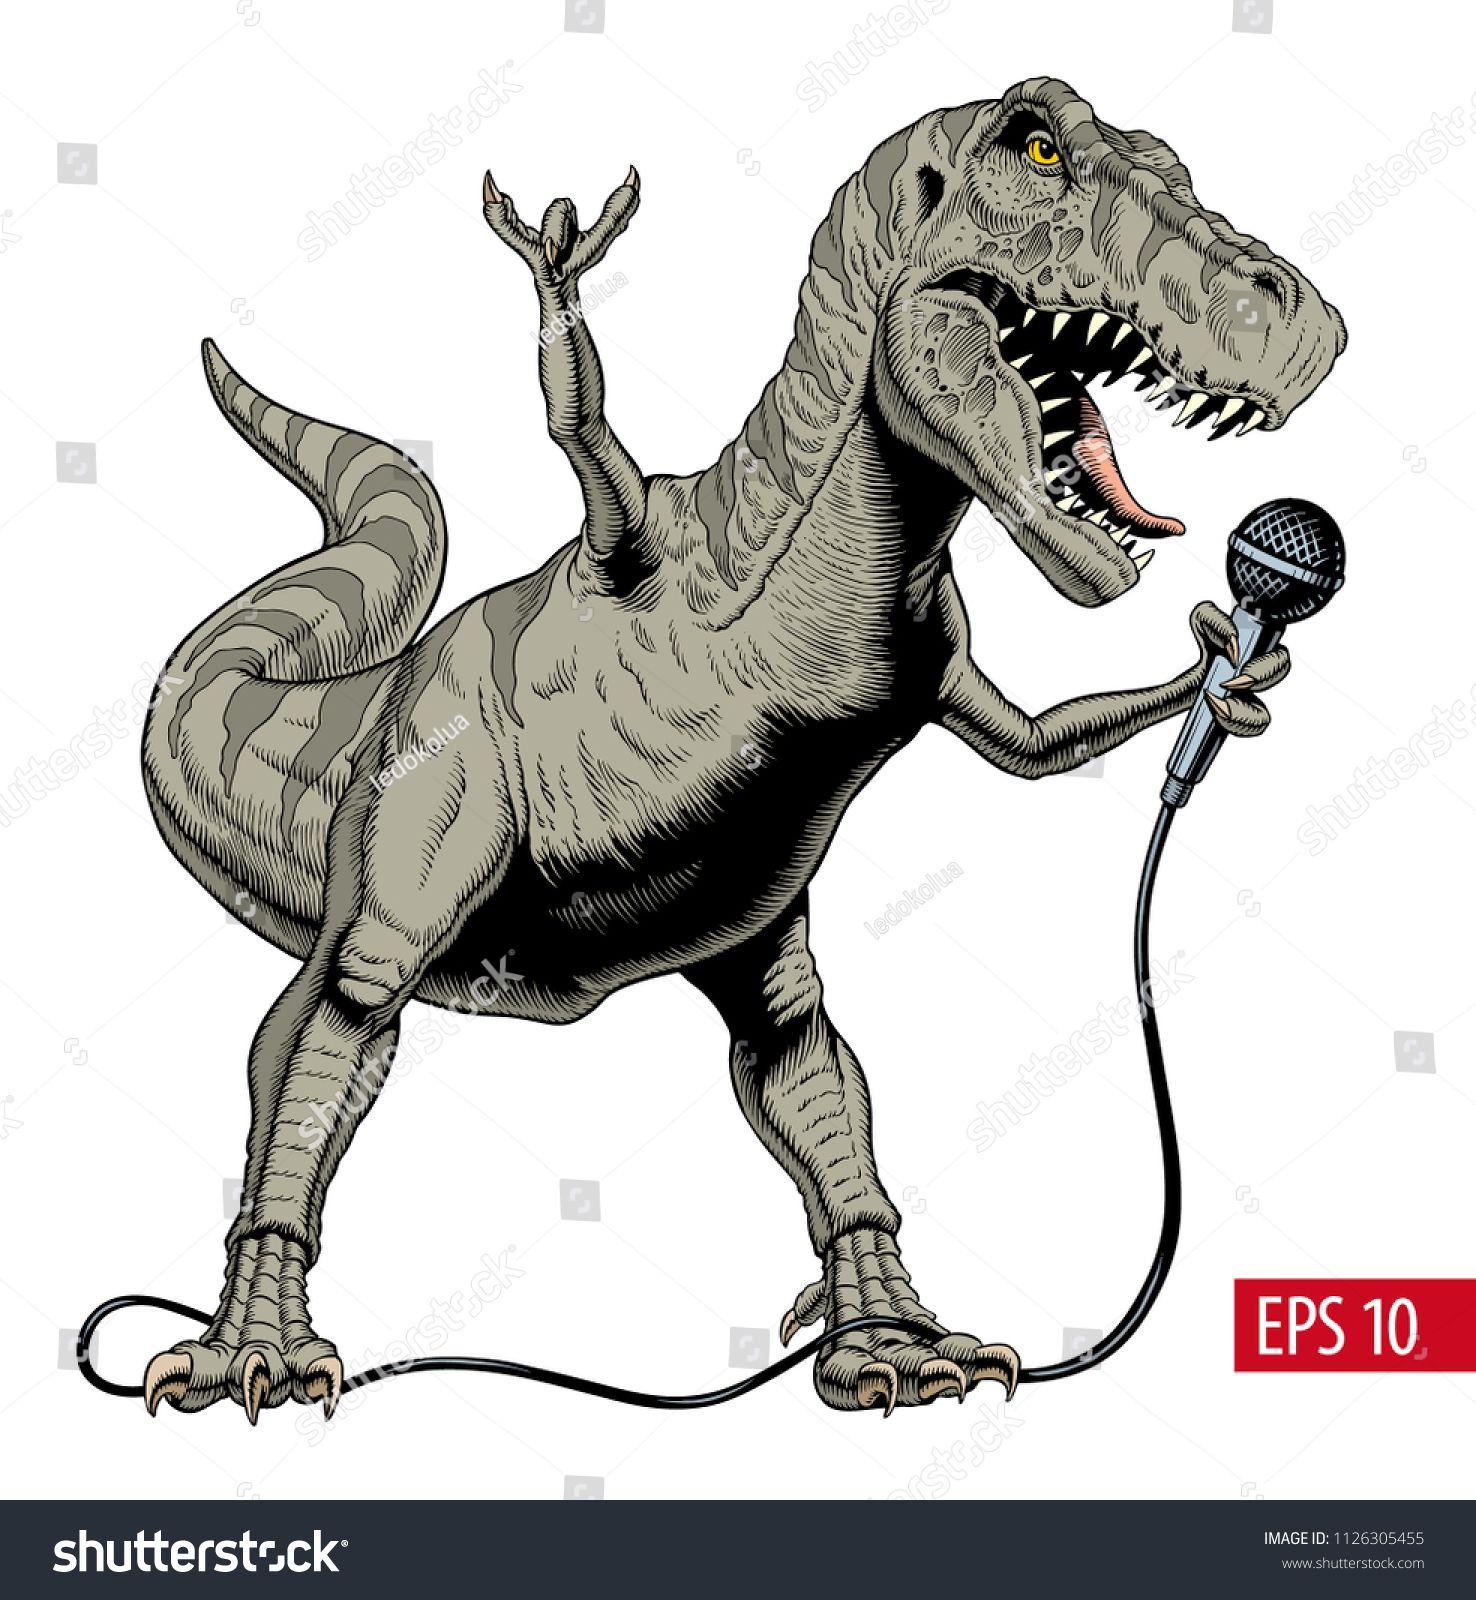 Dinosaur rock singer holding microphone. Tyrannosaurus or T. rex. Vector  illustration.singer#holding#Dinosaur#rock | Dinosaur, Tyrannosaurus,  Ilustration art